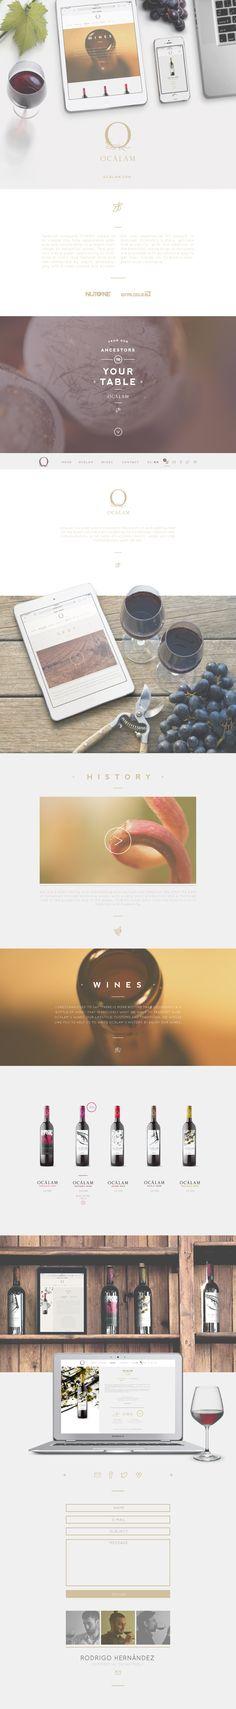 Spanish vineyard Ocalám website by nutone & binalogue